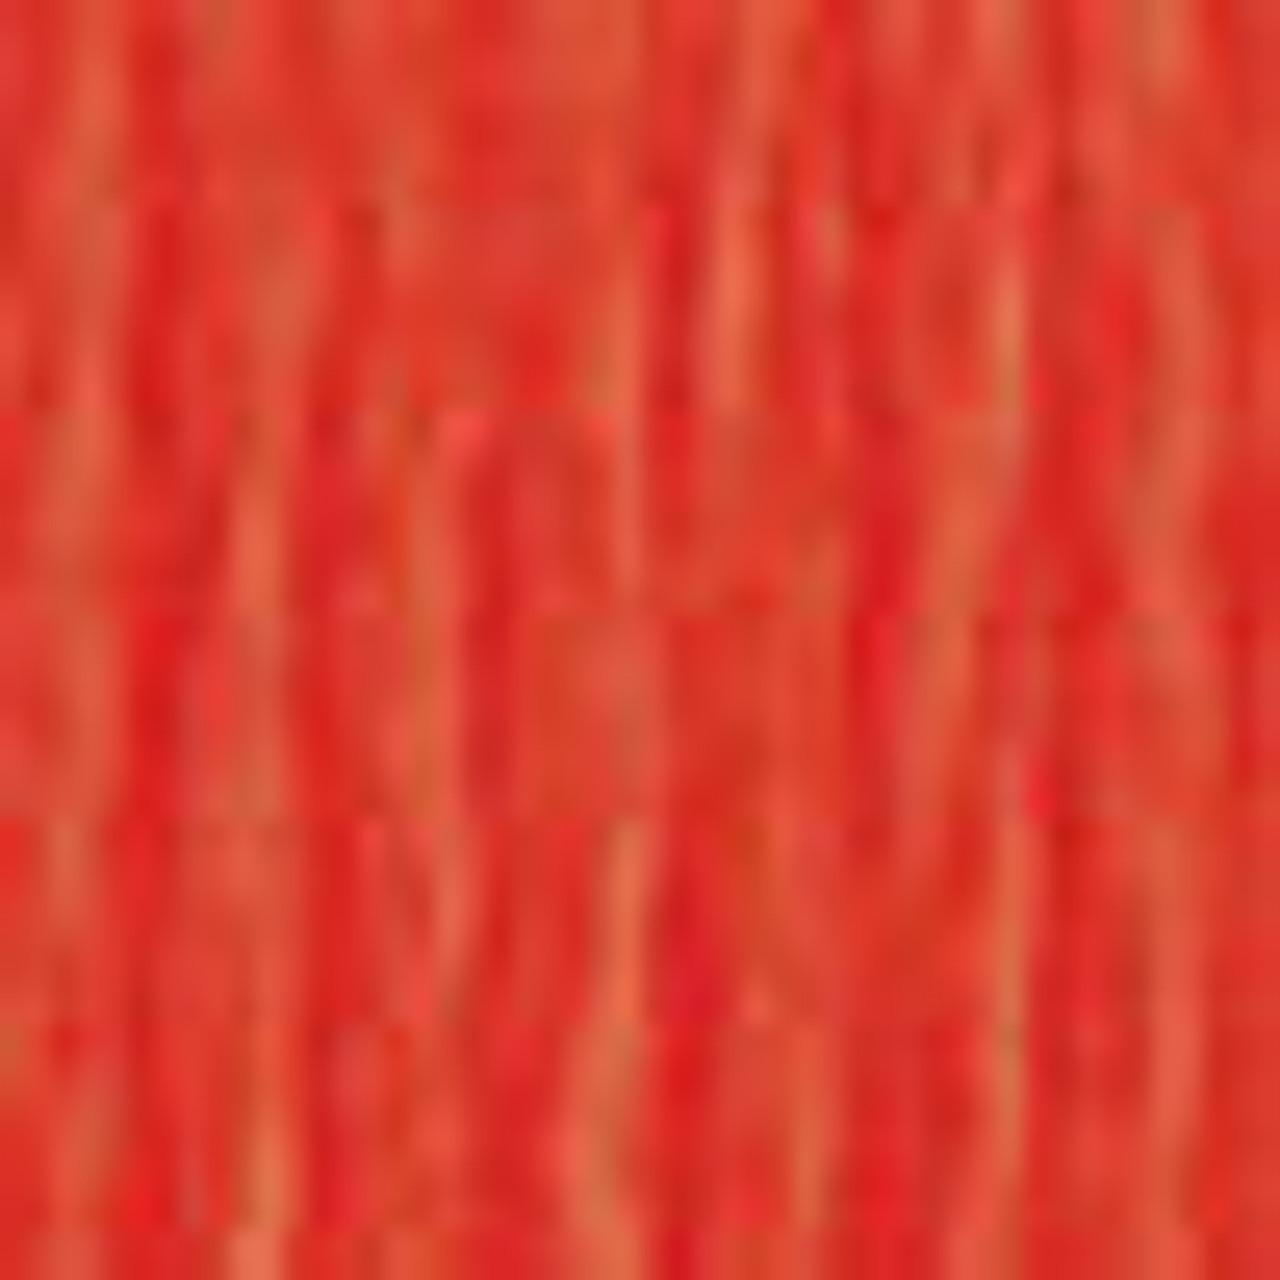 DMC # 350 Medium Coral Floss / Thread